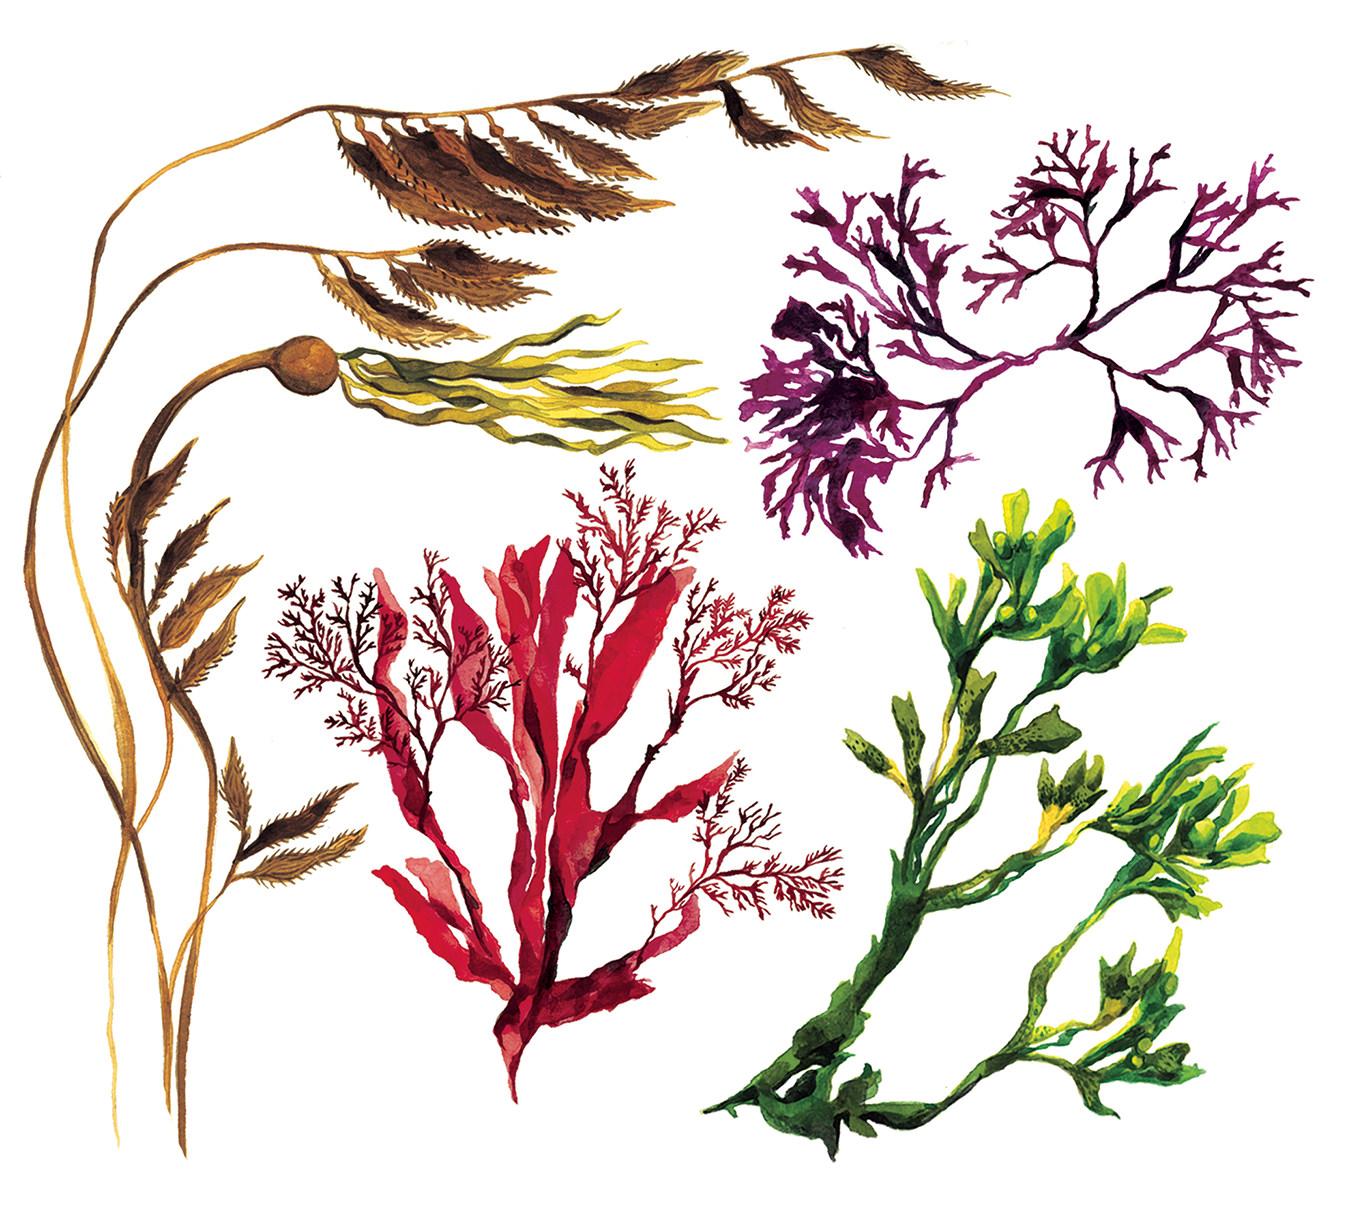 Seaweed Skin Care - MONTECRISTO